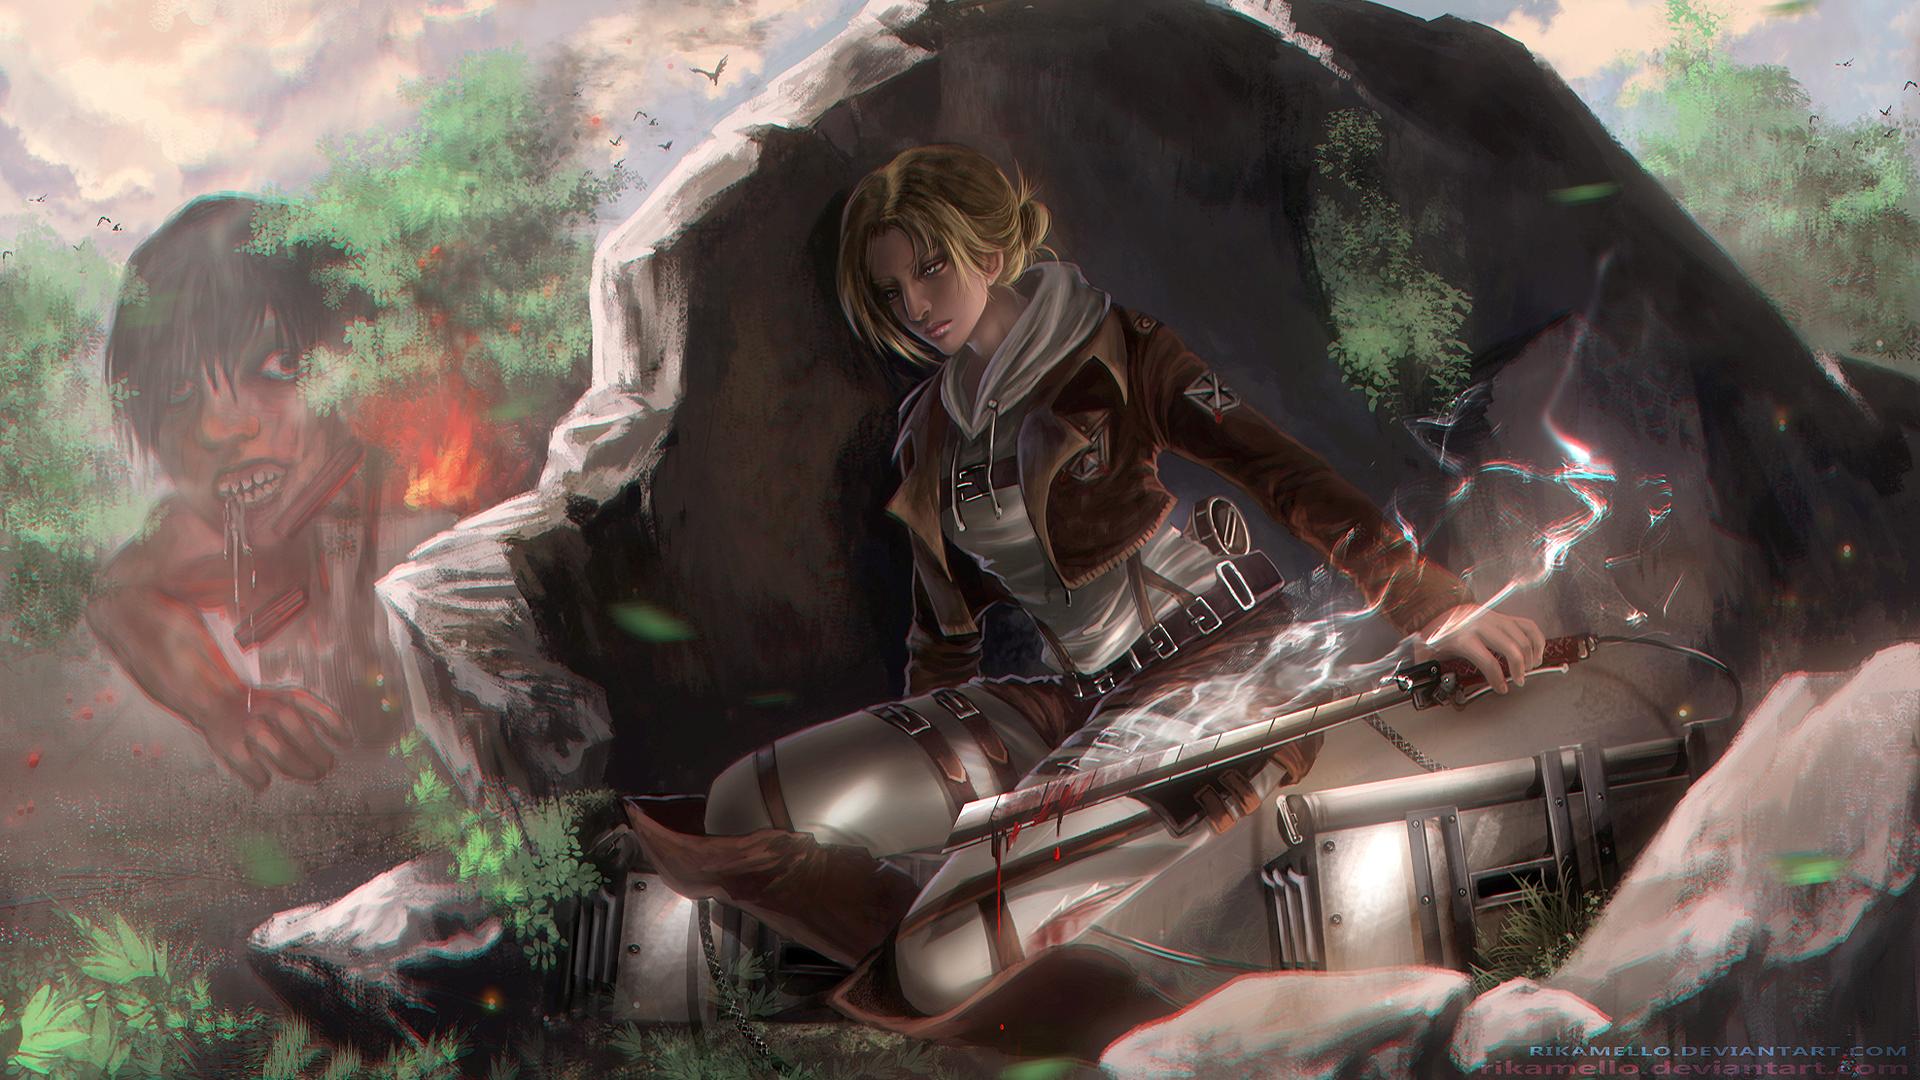 50 Attack On Titan Annie Wallpaper On Wallpapersafari